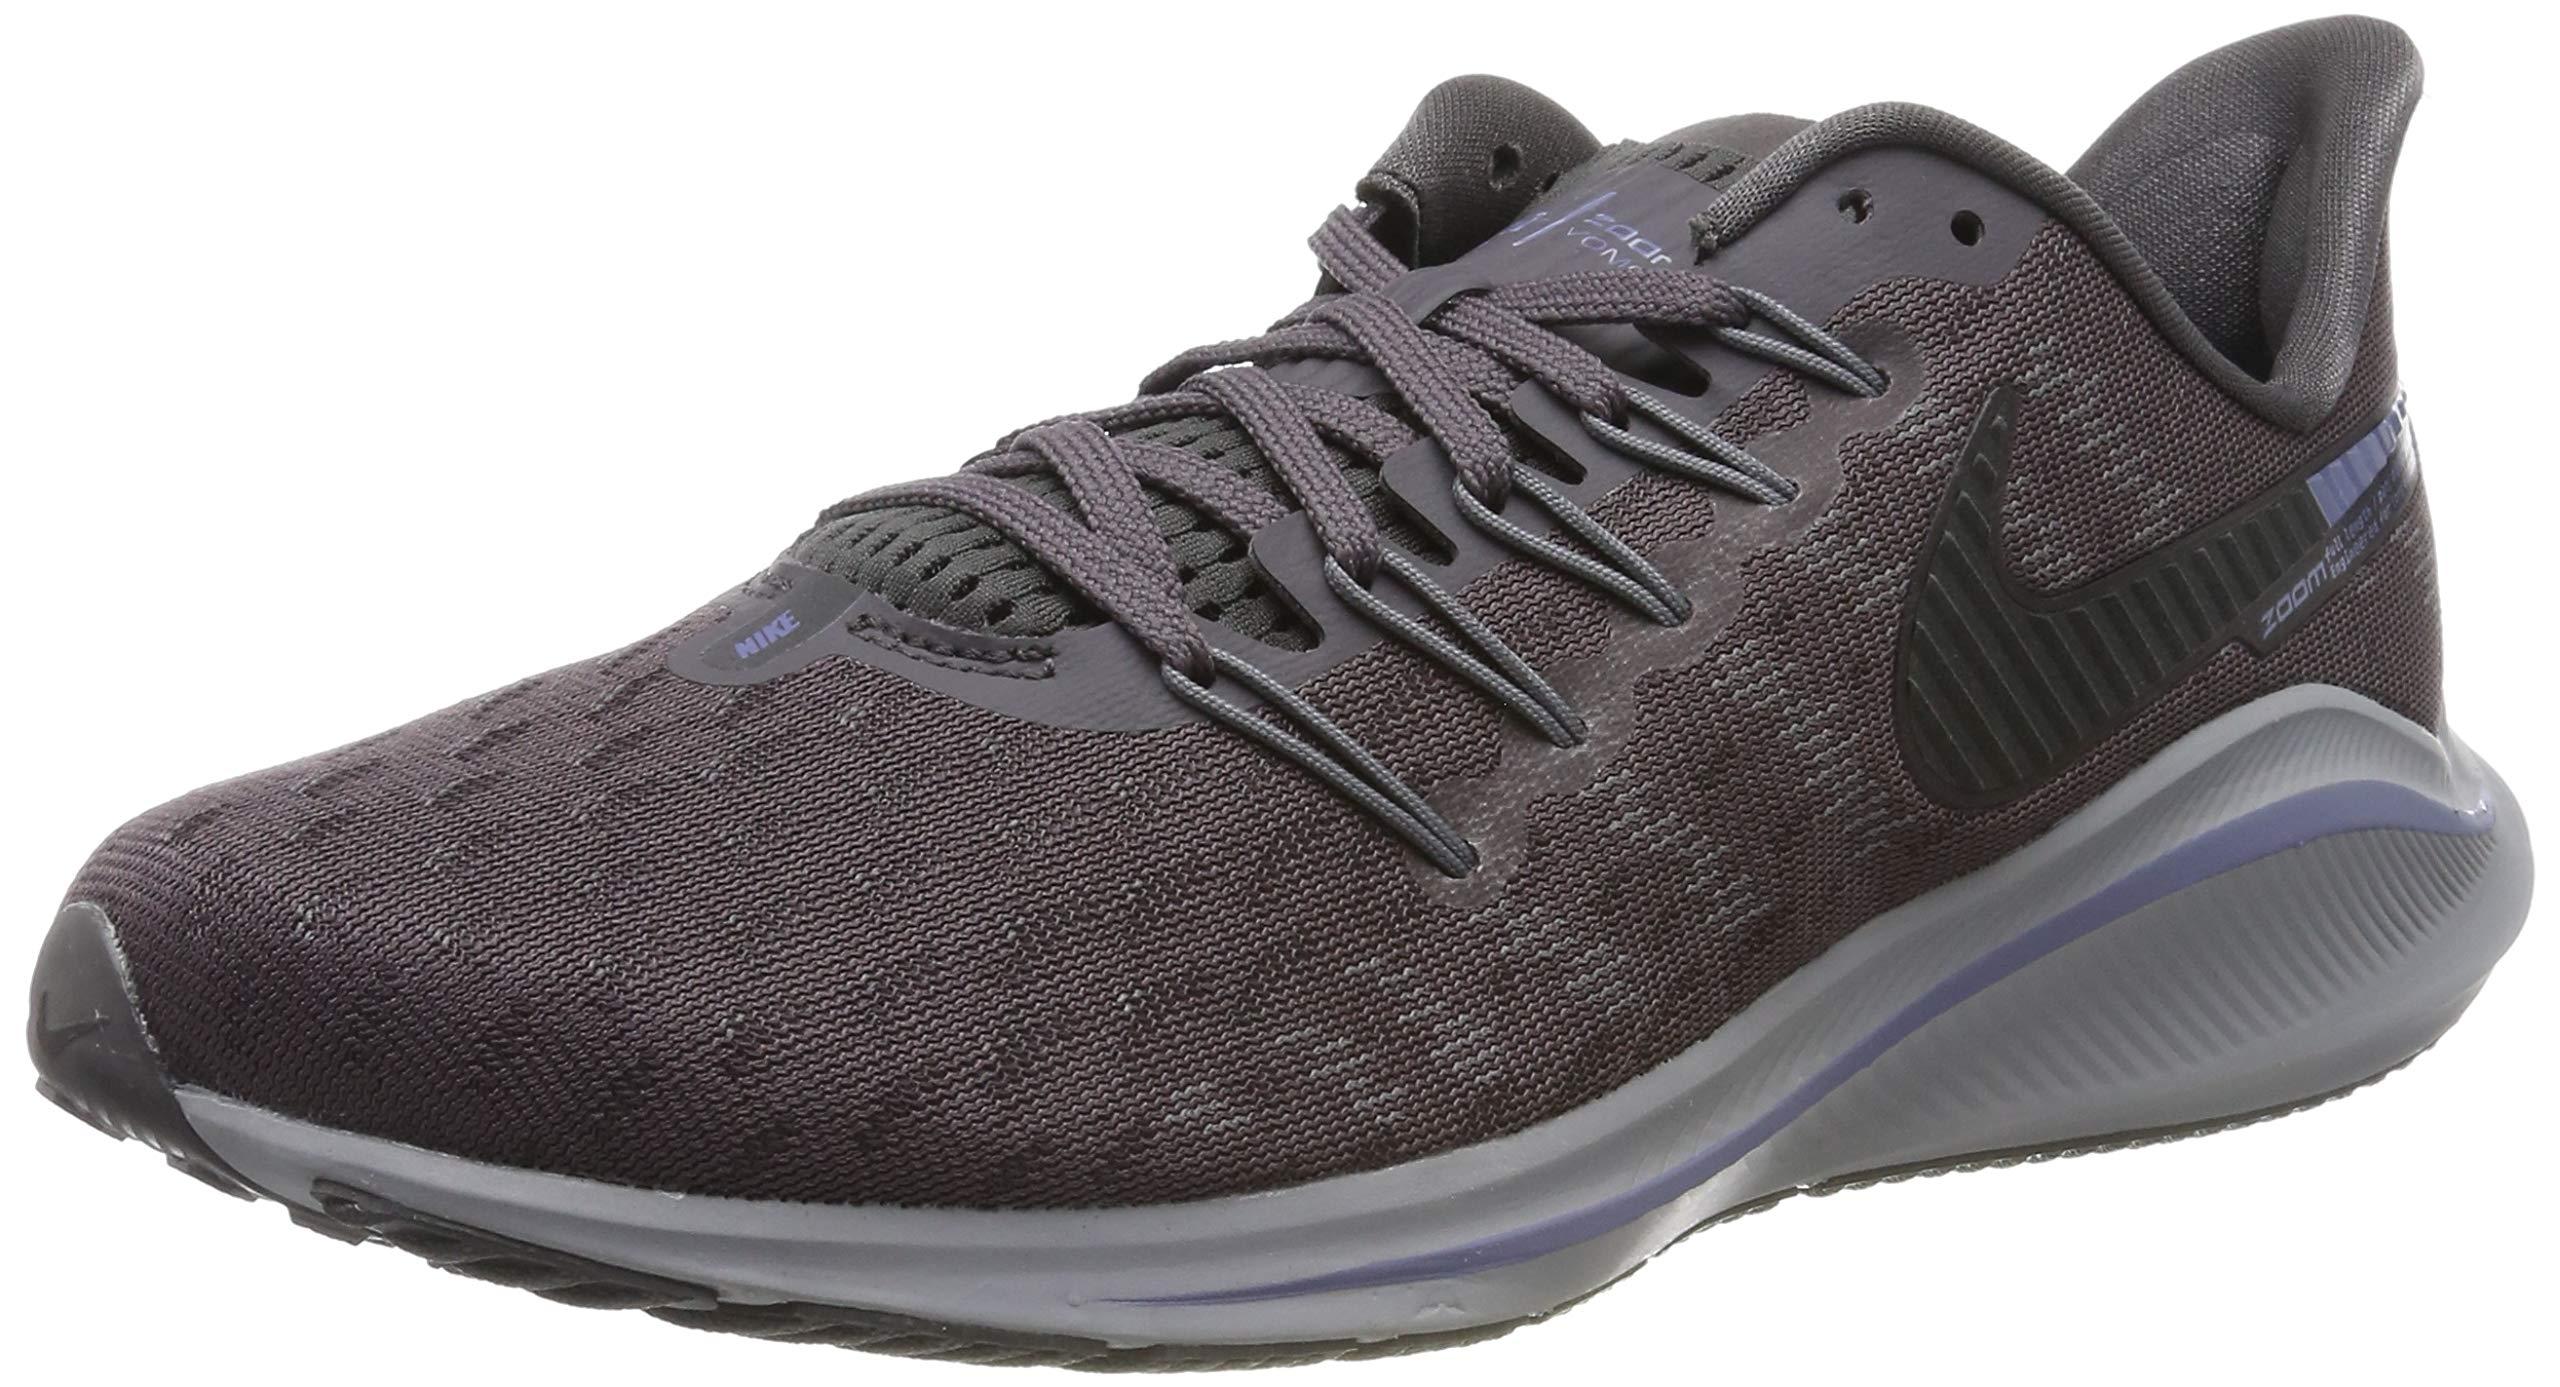 black 00541 De Grey Nike stellar Trail Indigo HommeMulticolorethunder Zoom Vomero Eu 14Chaussures Air jL4Aq3Rc5